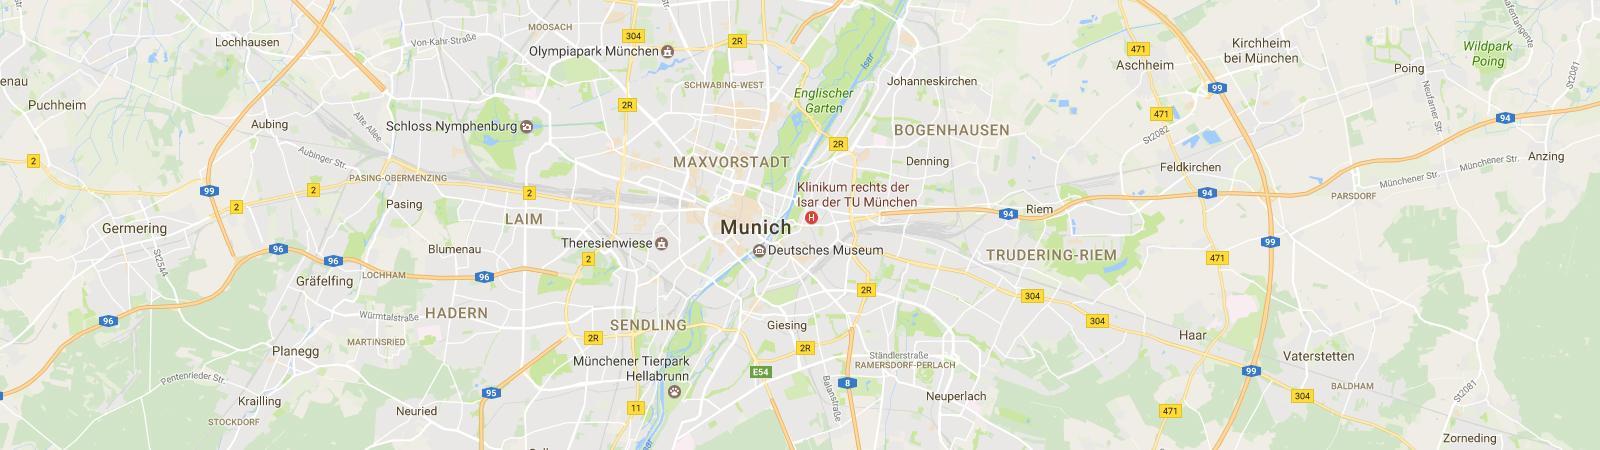 carsharing_city-page-business-area__DE EN Munich